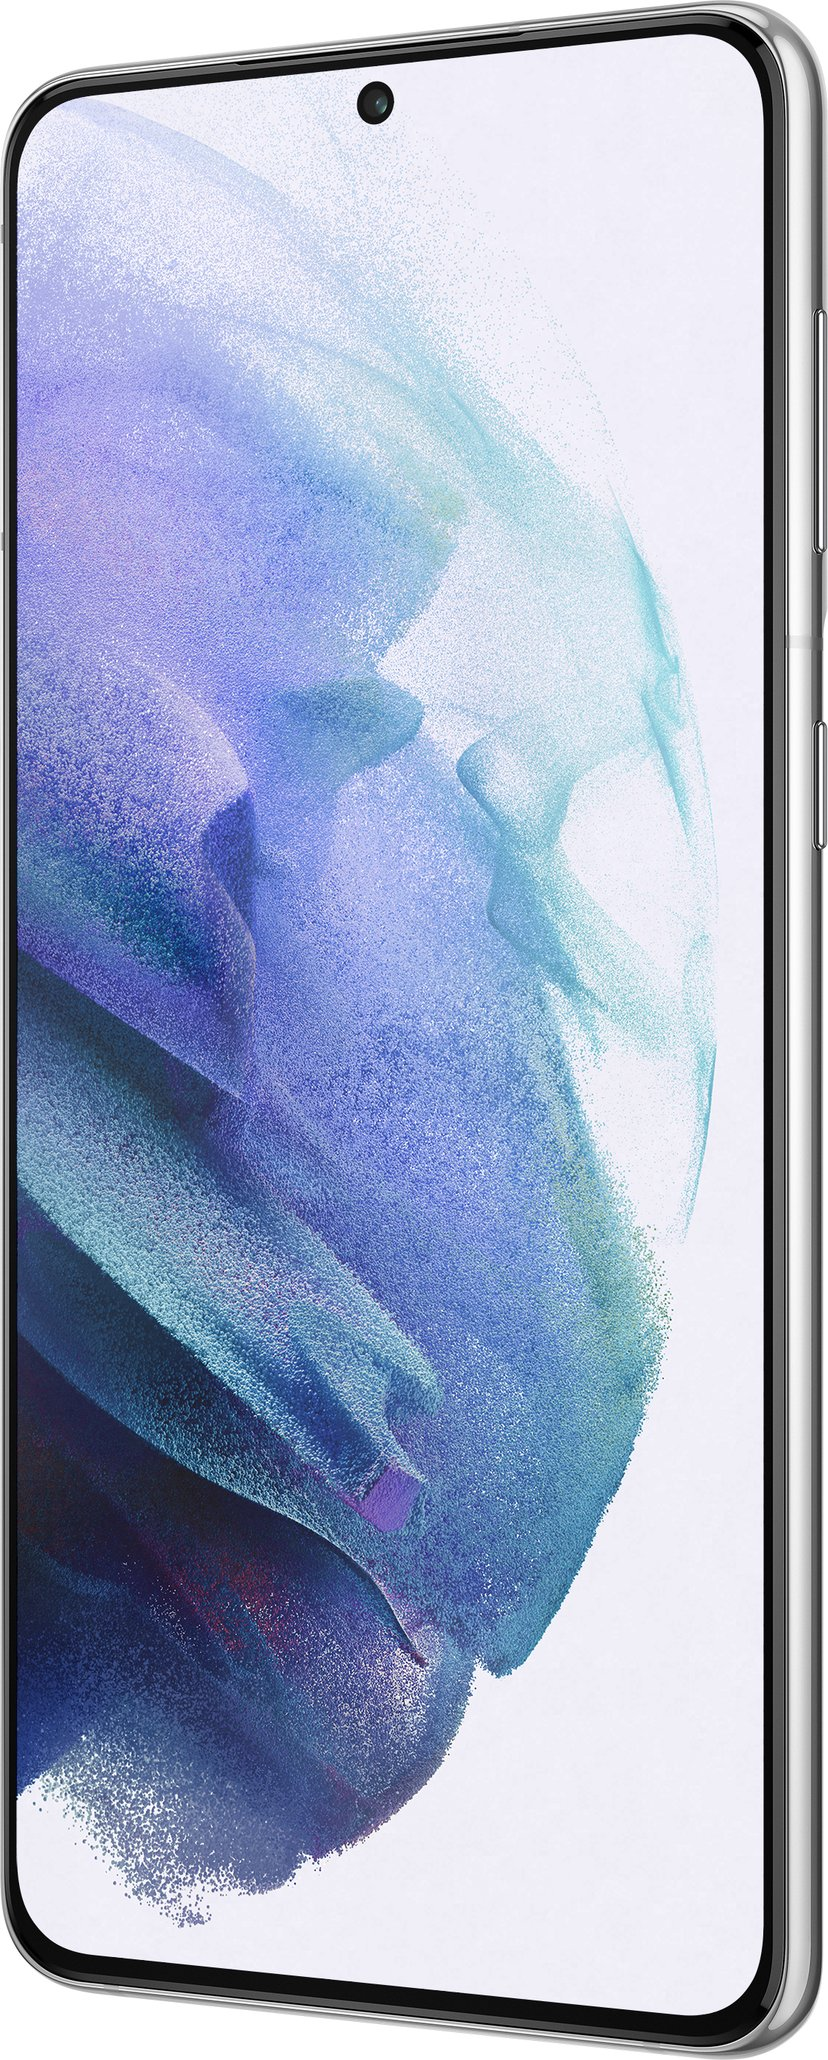 Samsung Galaxy S21+ 5G 128GB Kaksois-SIM Haamun hopea